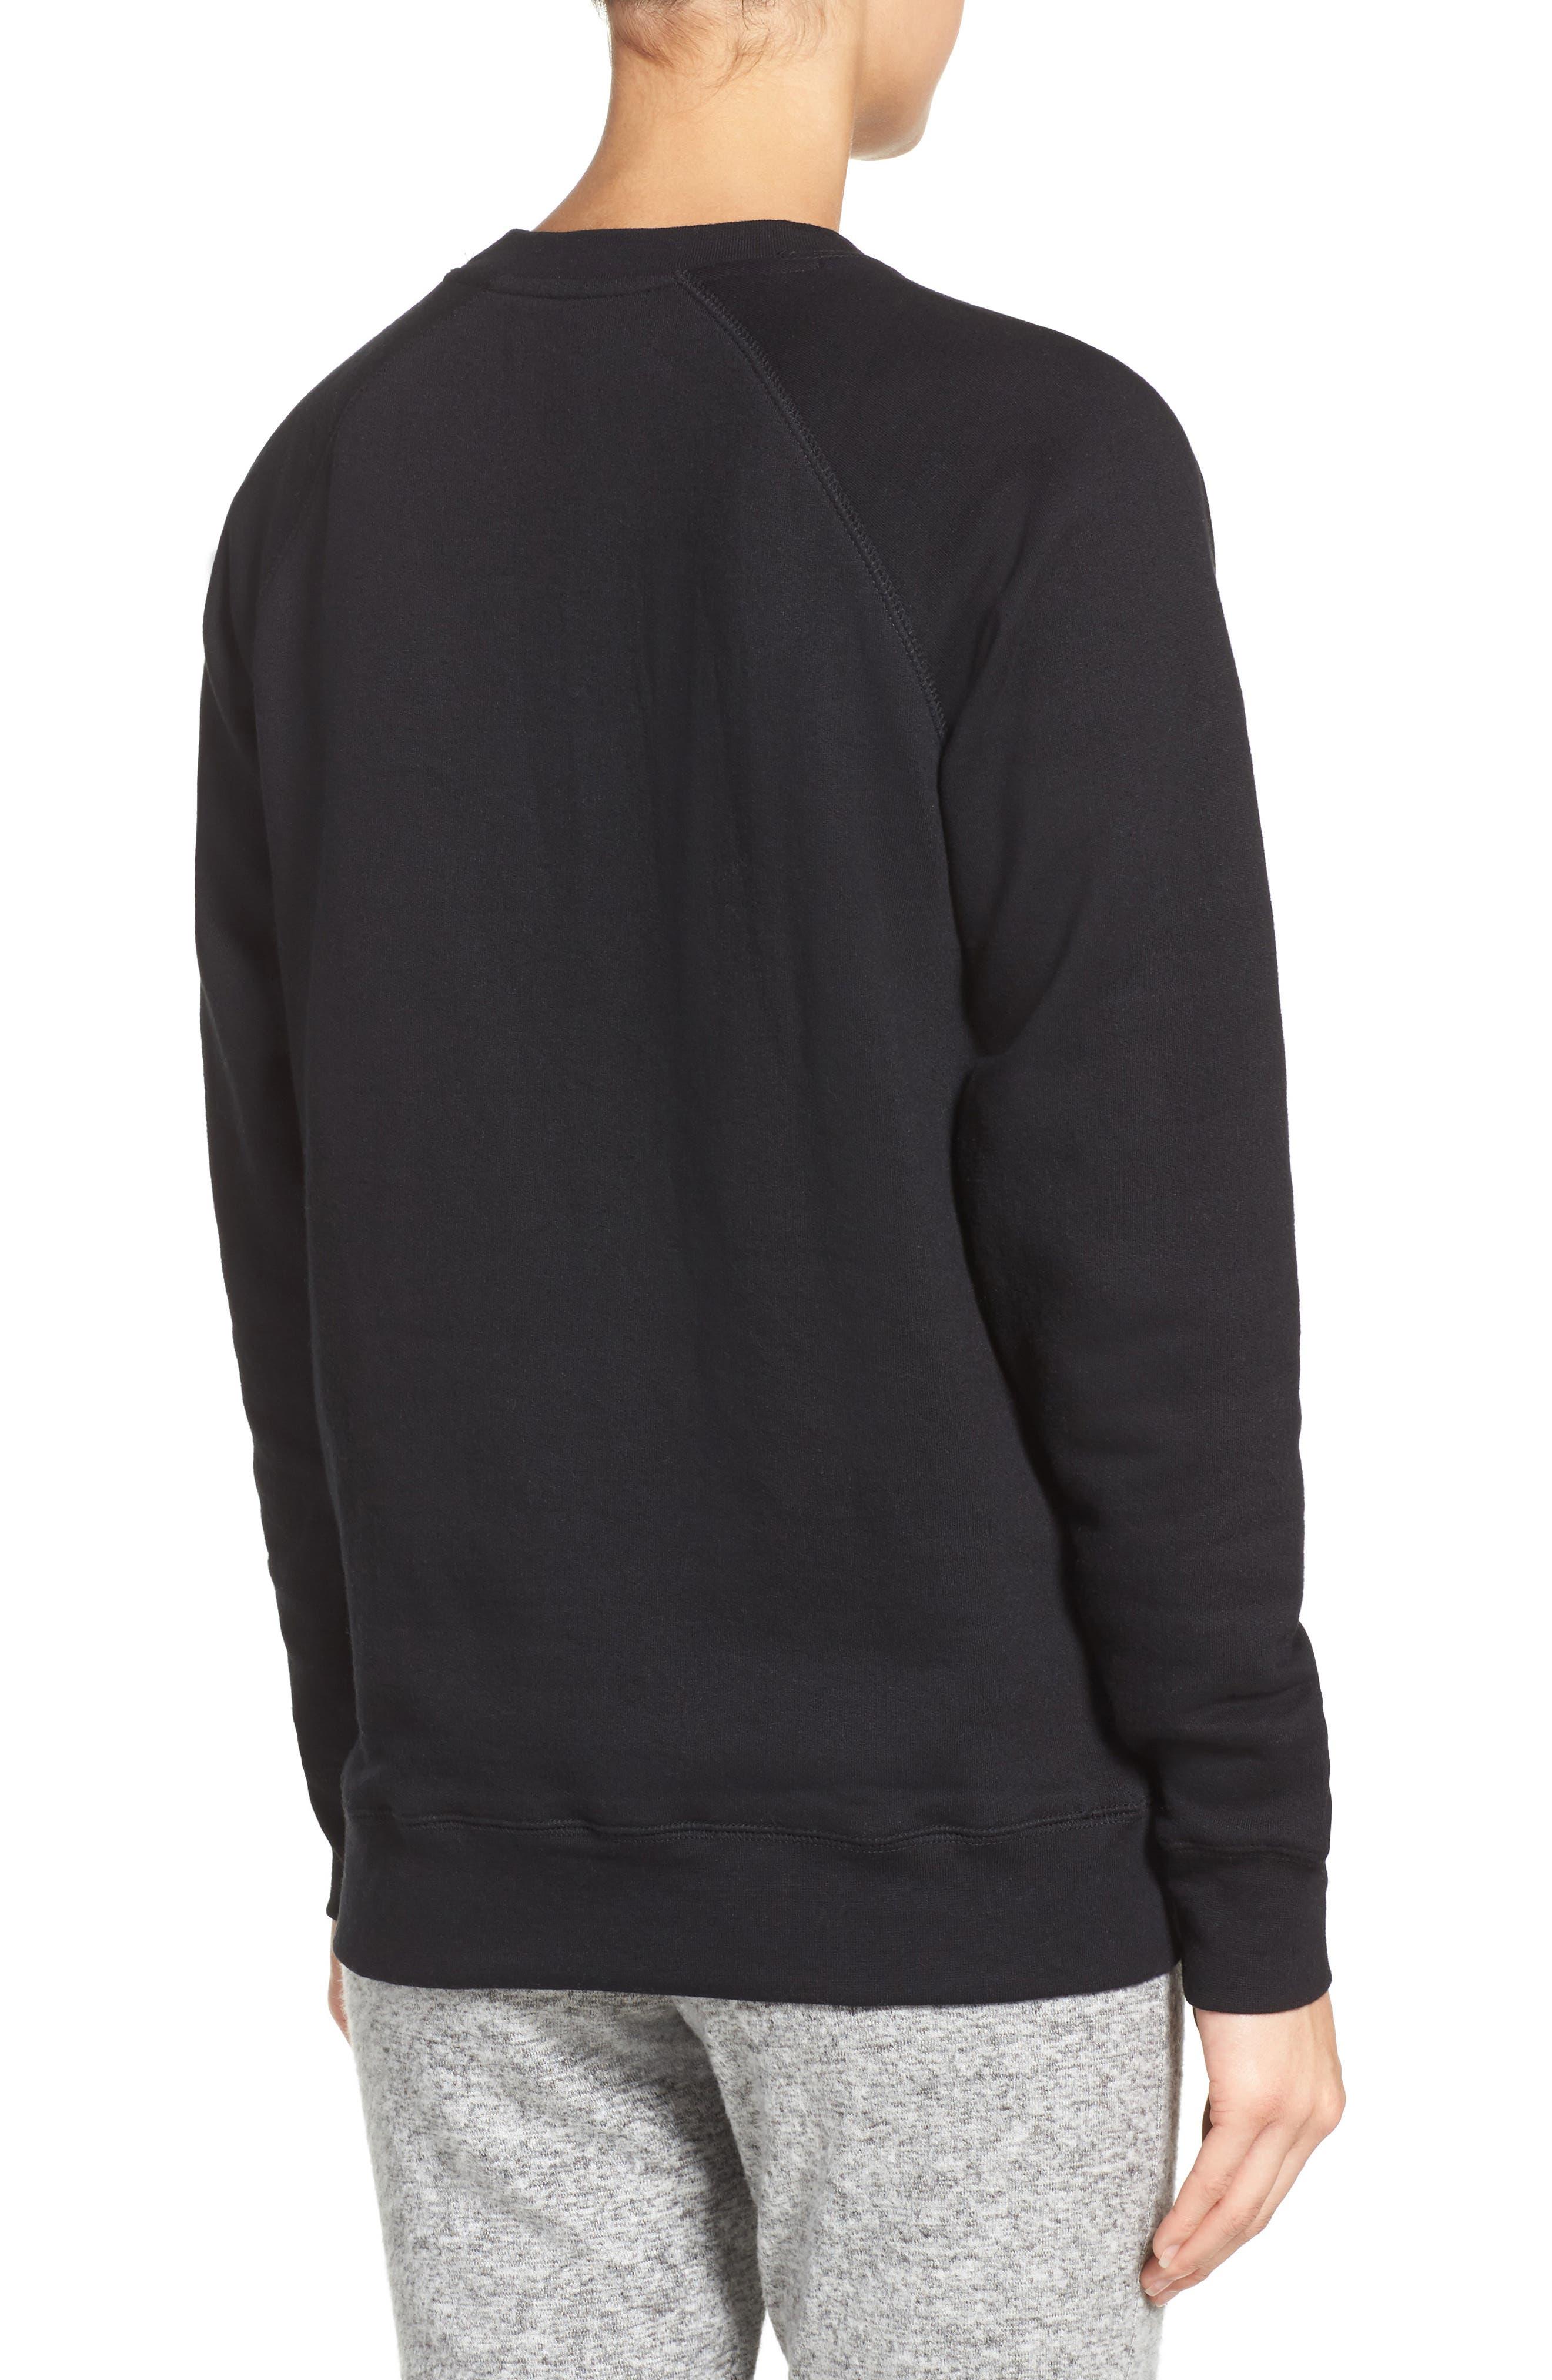 Brunette 'Coffee Now' Crewneck Sweatshirt,                             Alternate thumbnail 2, color,                             Black